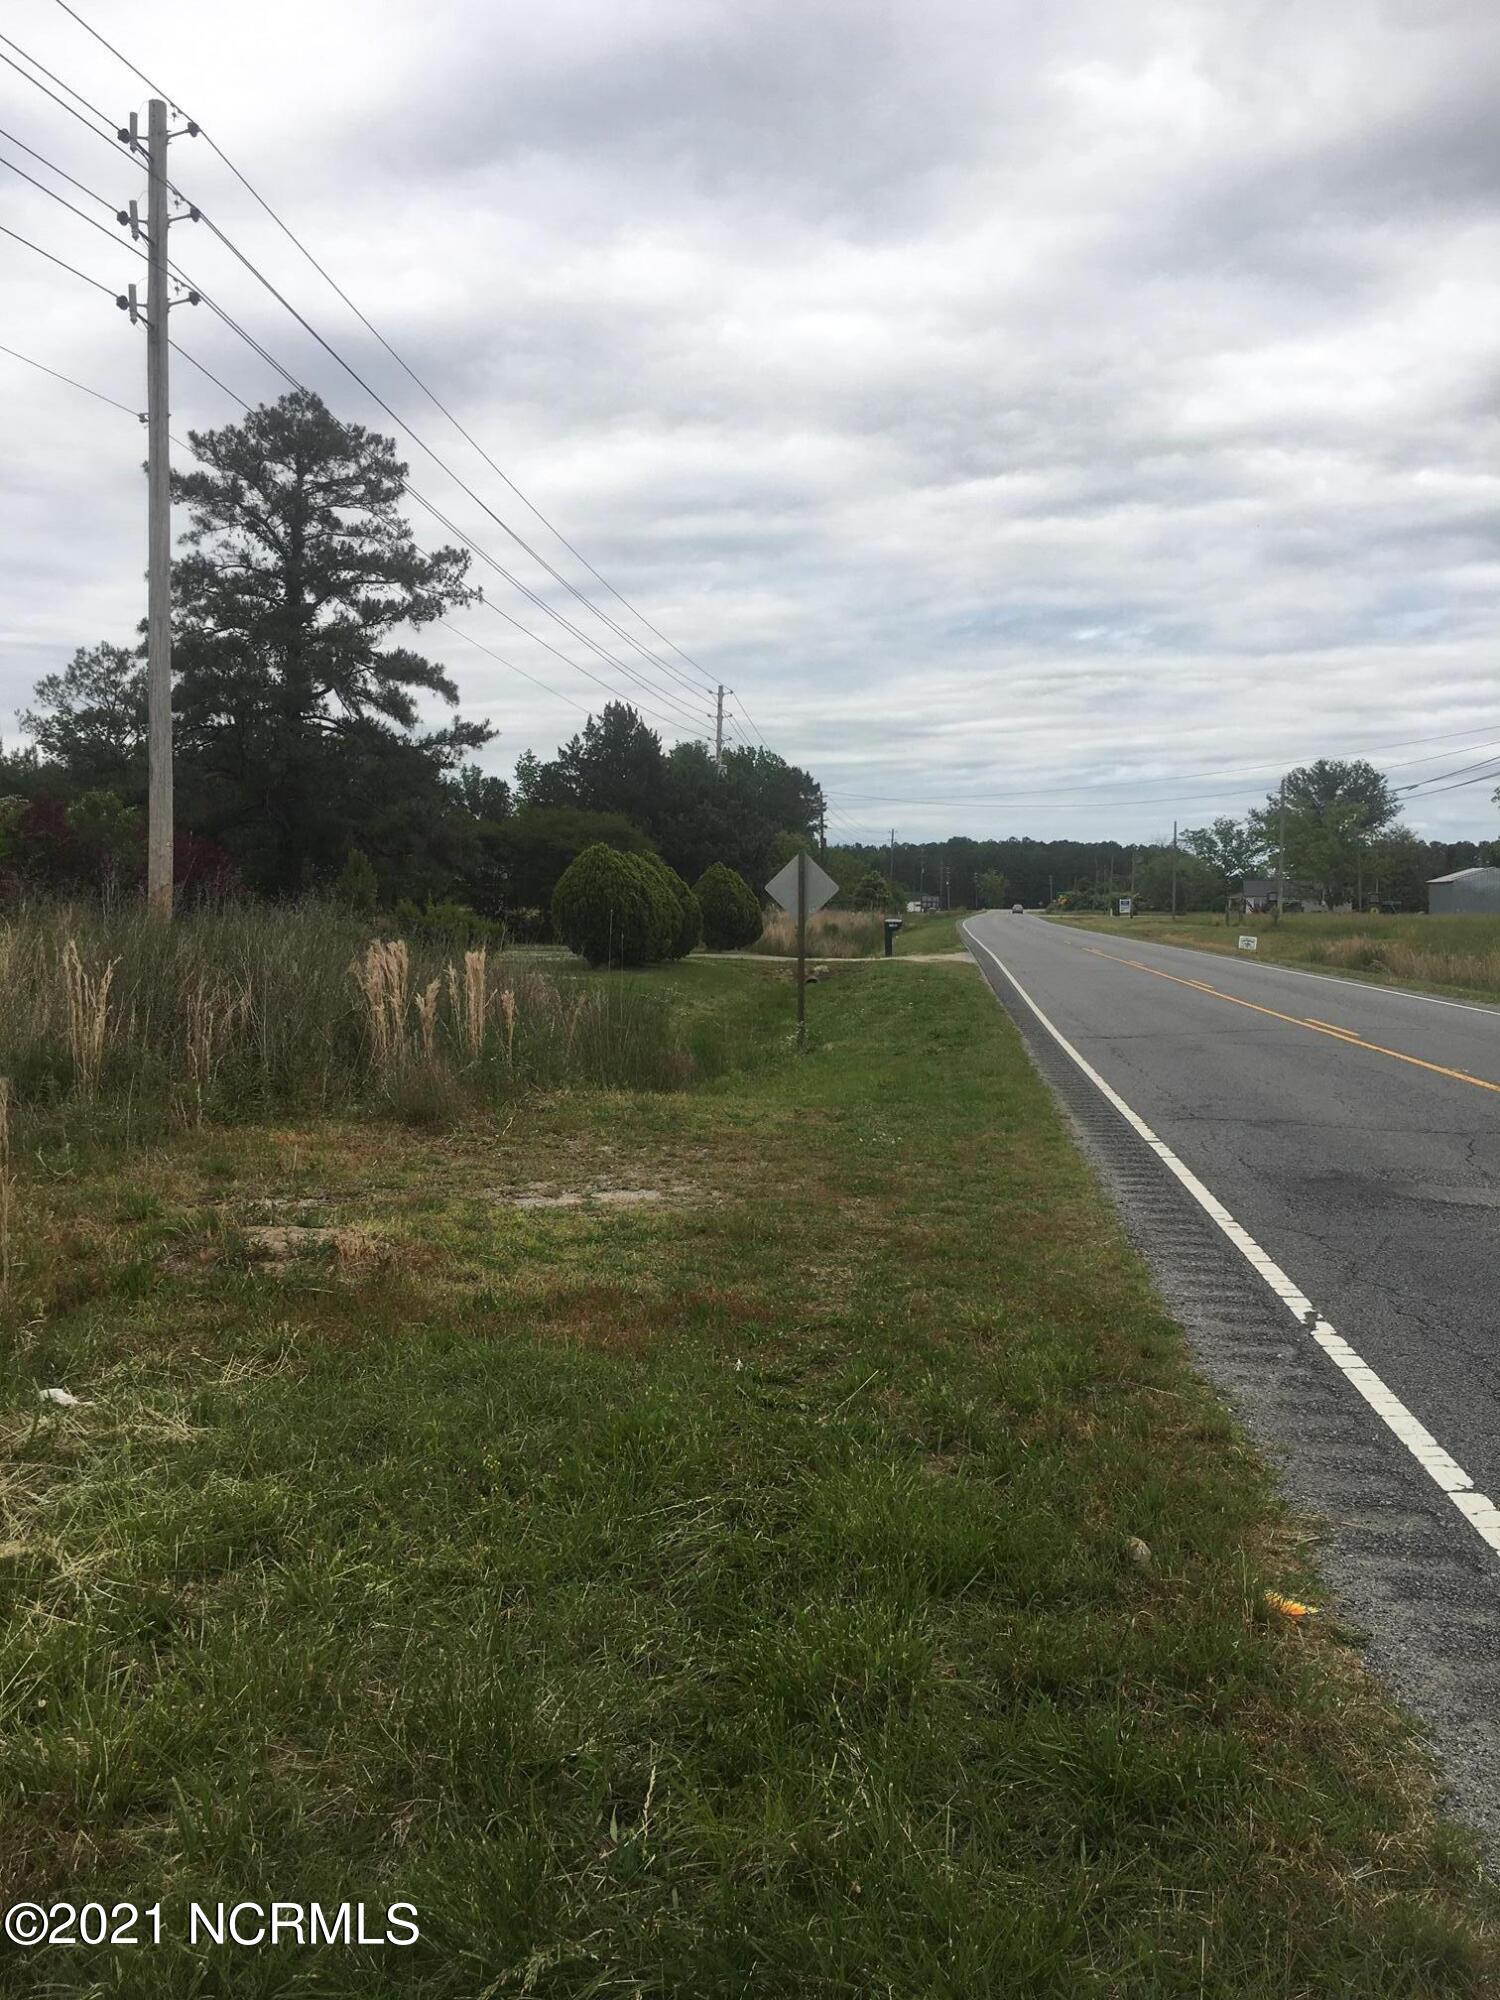 000 Highway 17, New Bern, North Carolina 28562, ,Undeveloped,For sale,Highway 17,100270912